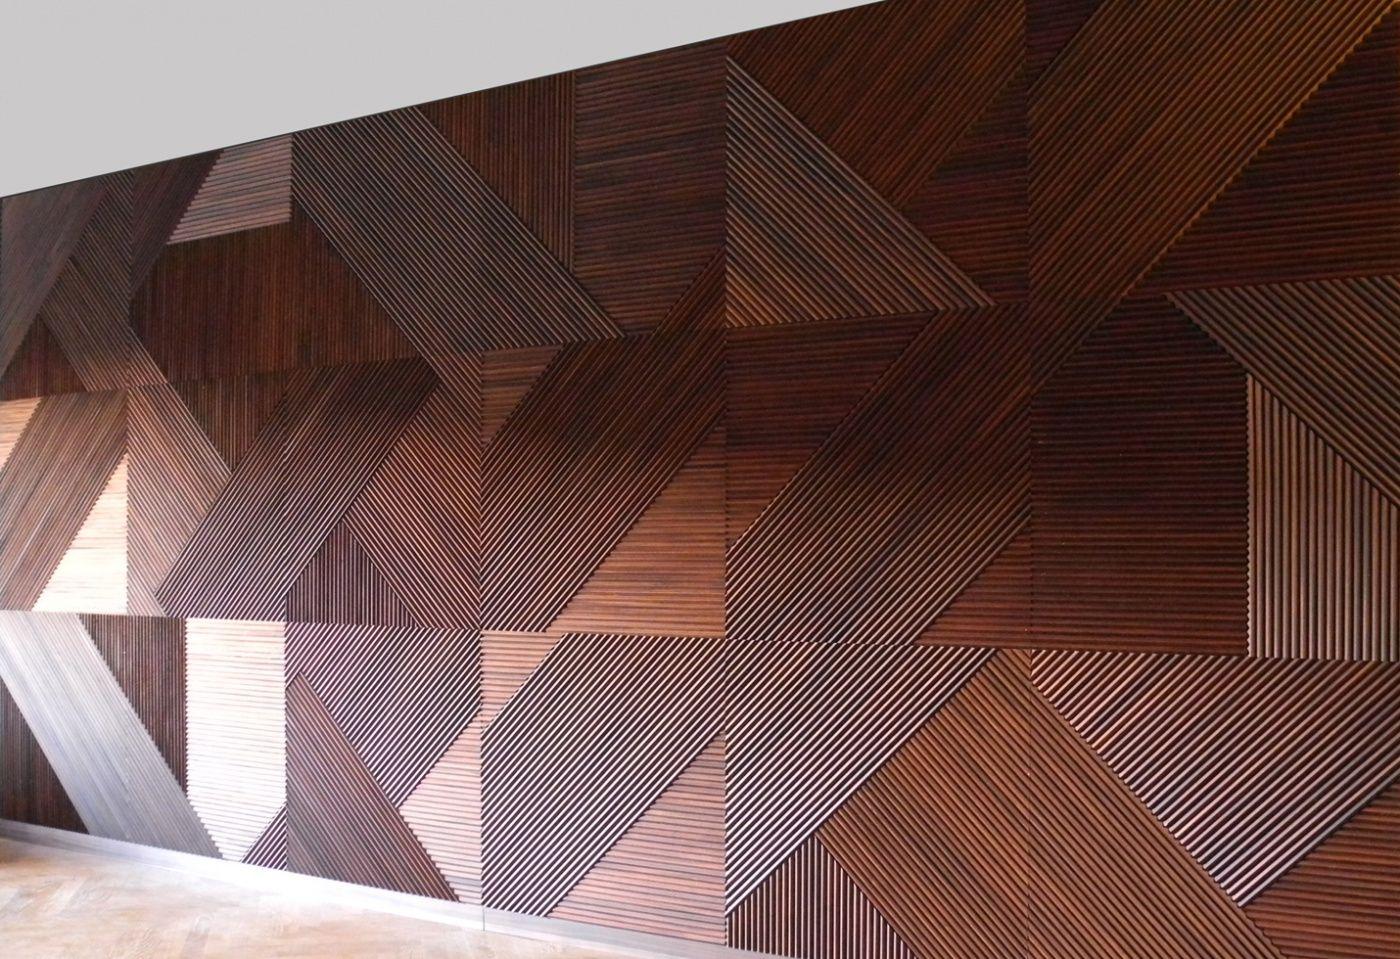 Pin from textures textured walls wall - Contemporary wall panels interior ...